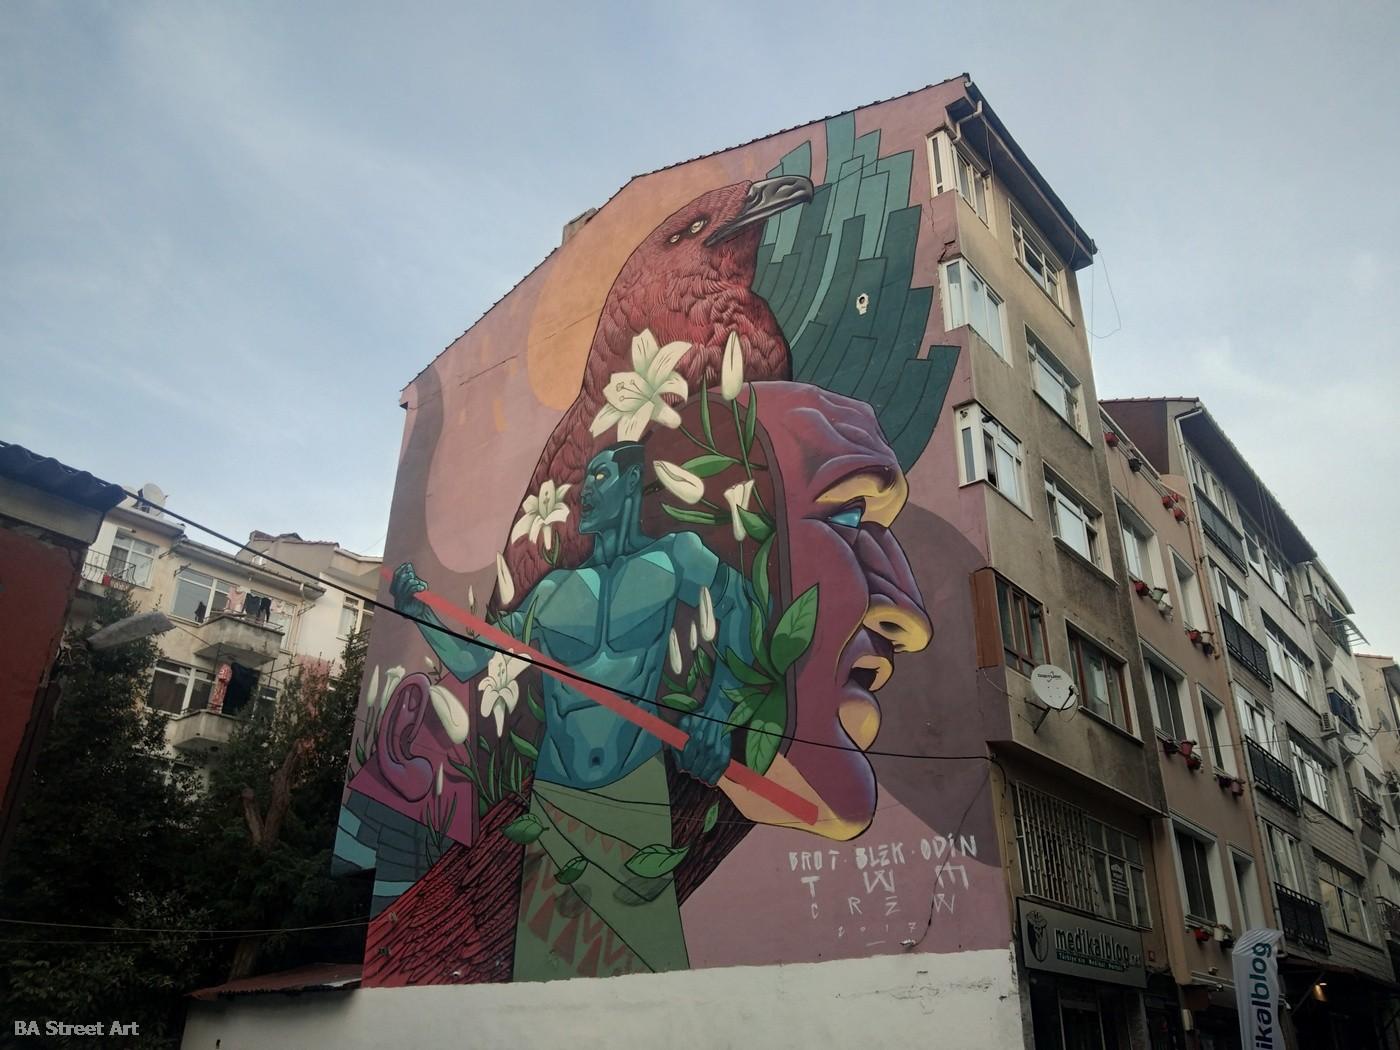 kadikoy street art istanbul murals graffiti tour the writer material blek brot odin